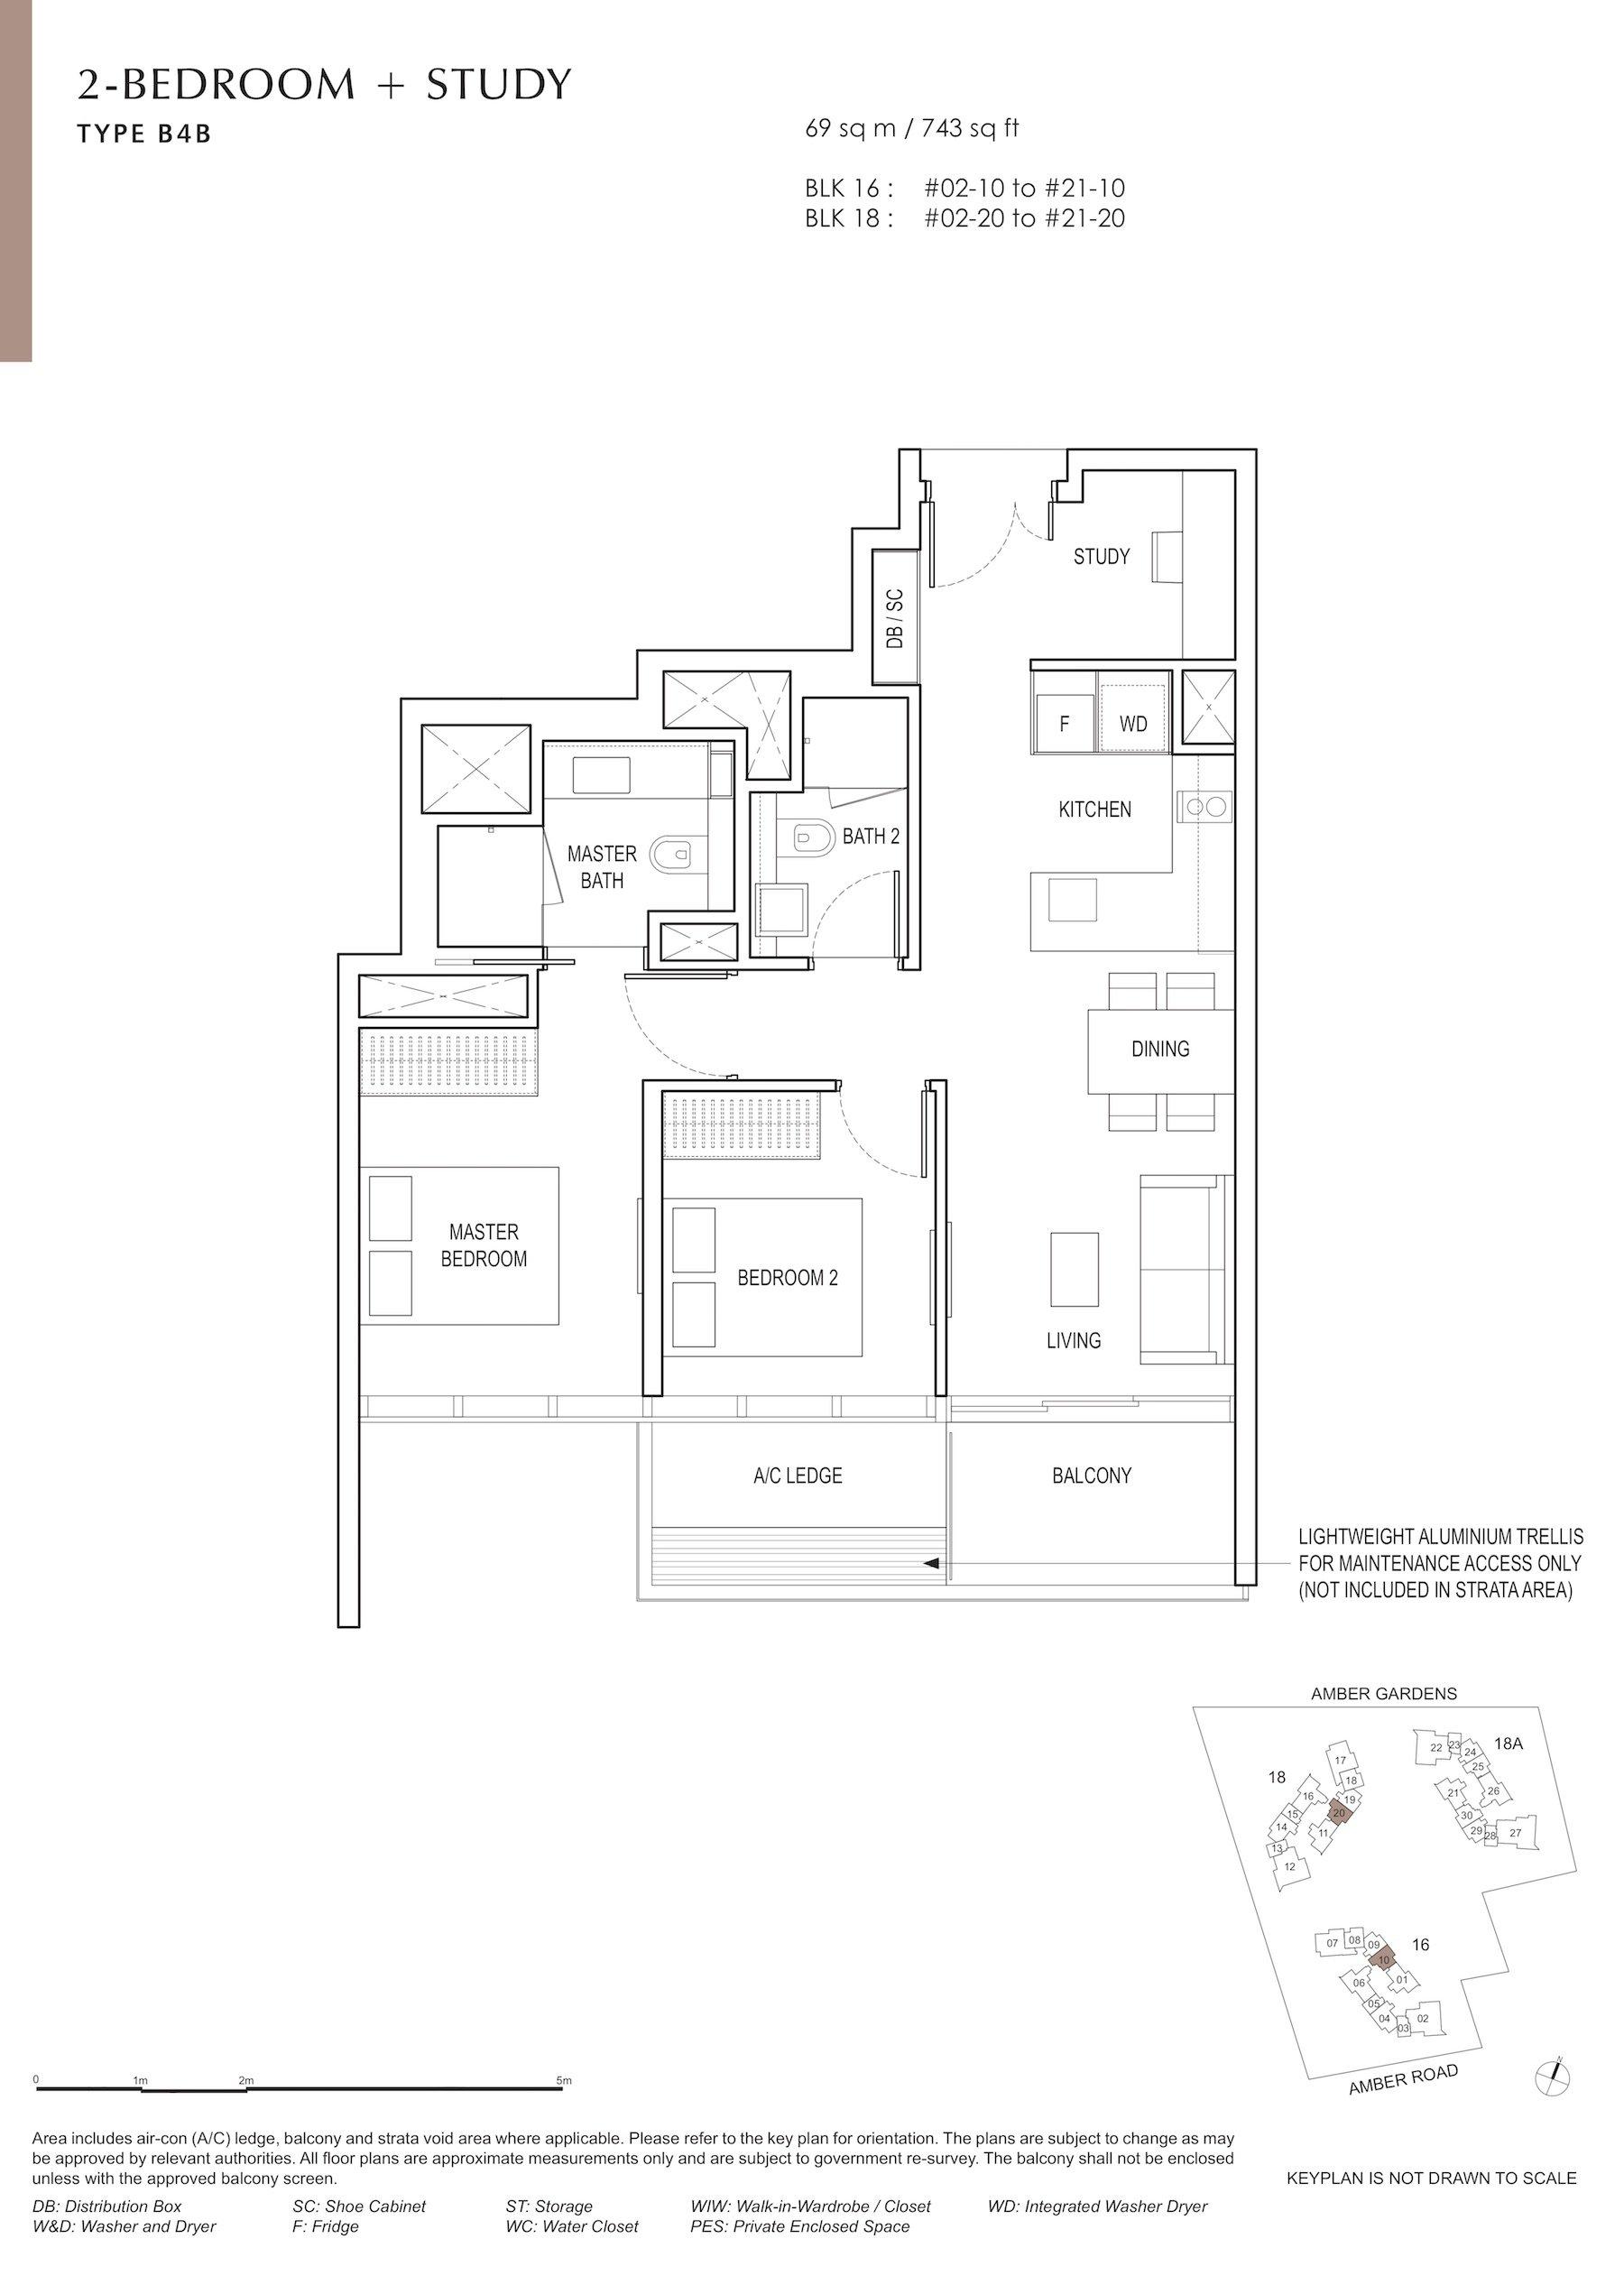 Amber Park 安铂苑 floor plan 2 bedroom + study 2卧房+书房 B4B